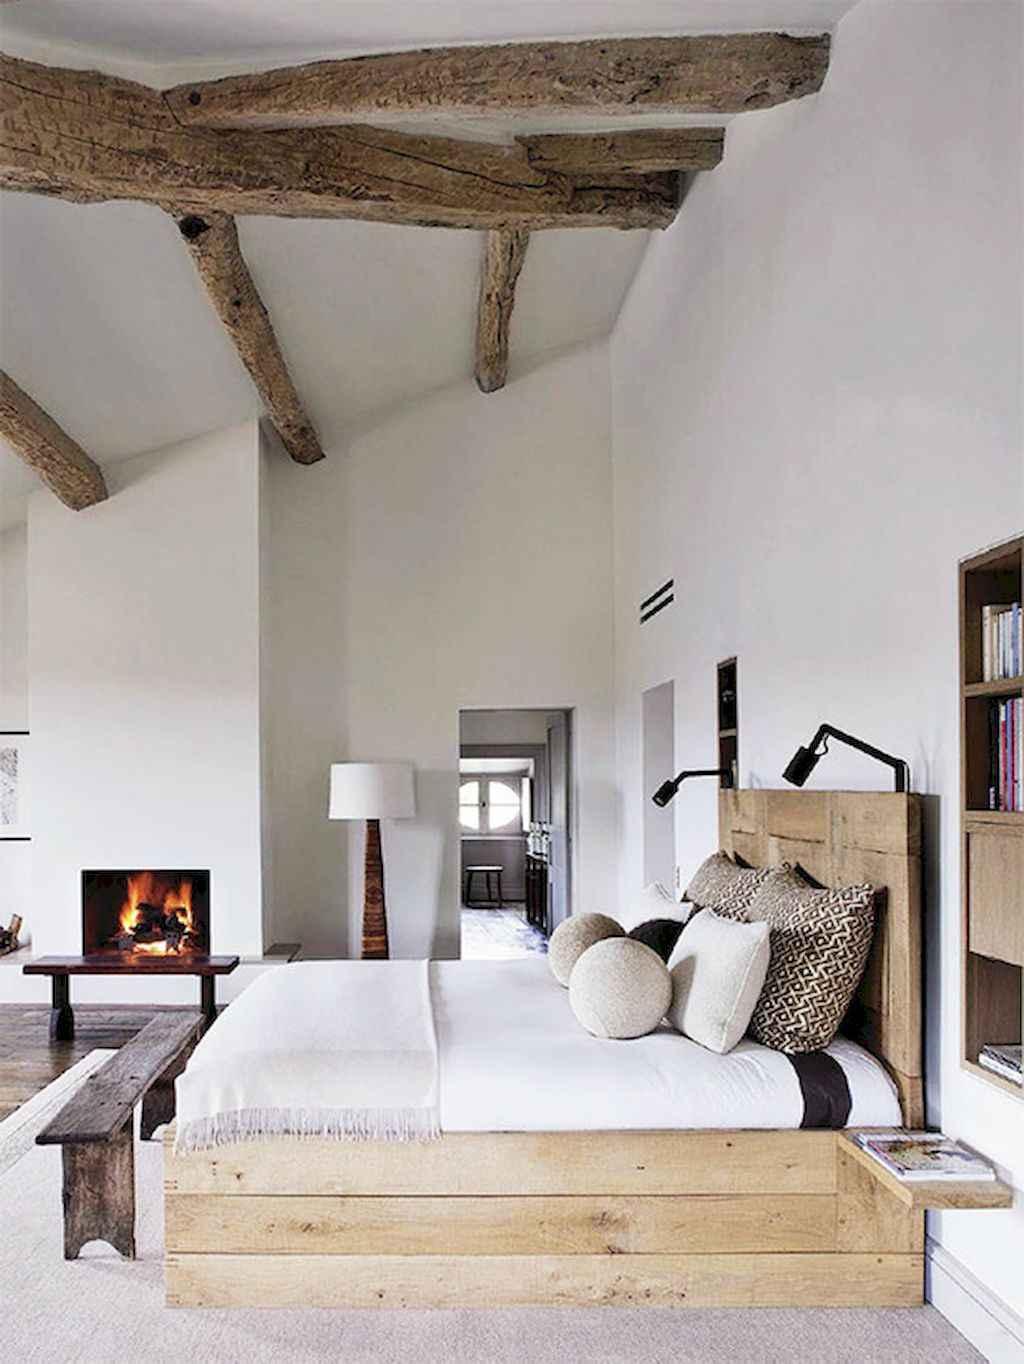 Gorgeous rustic master bedroom design & decor ideas (10)